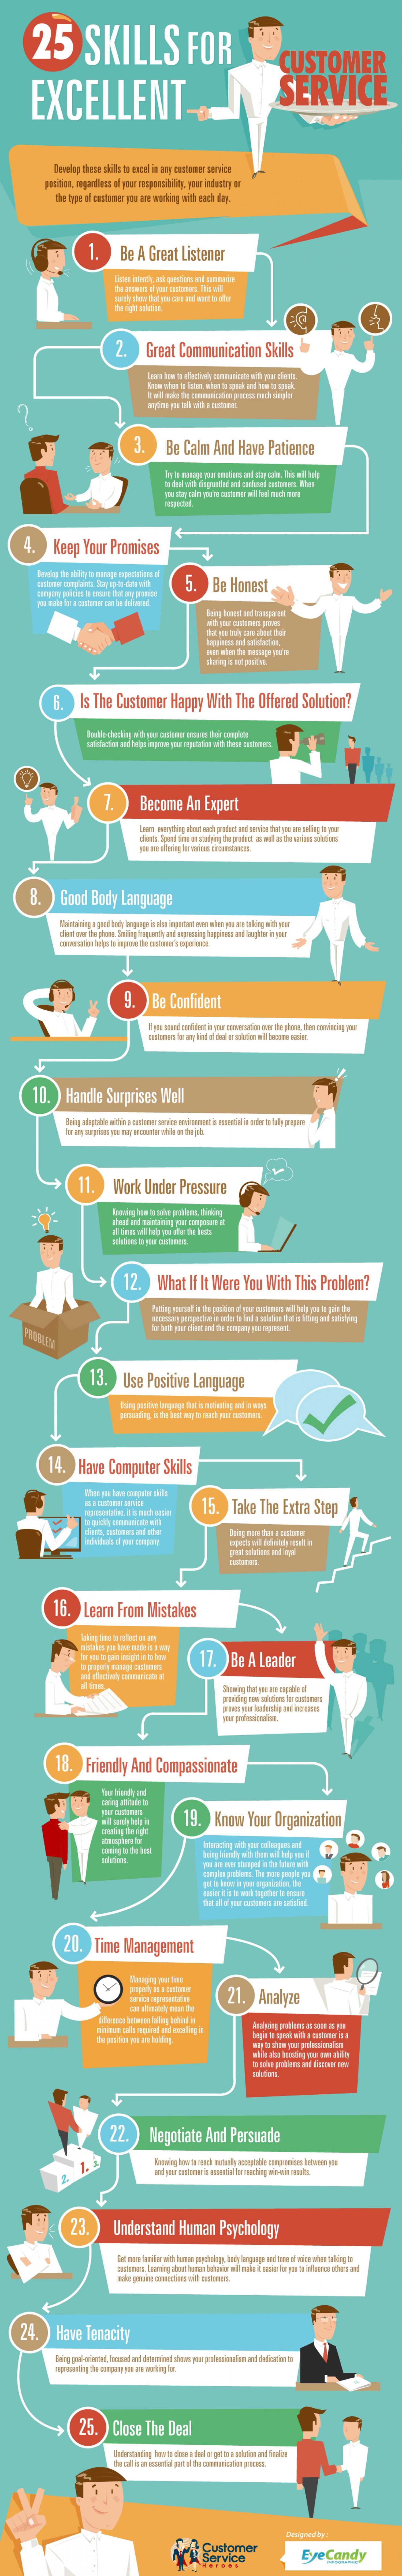 customer-service-skills.jpg